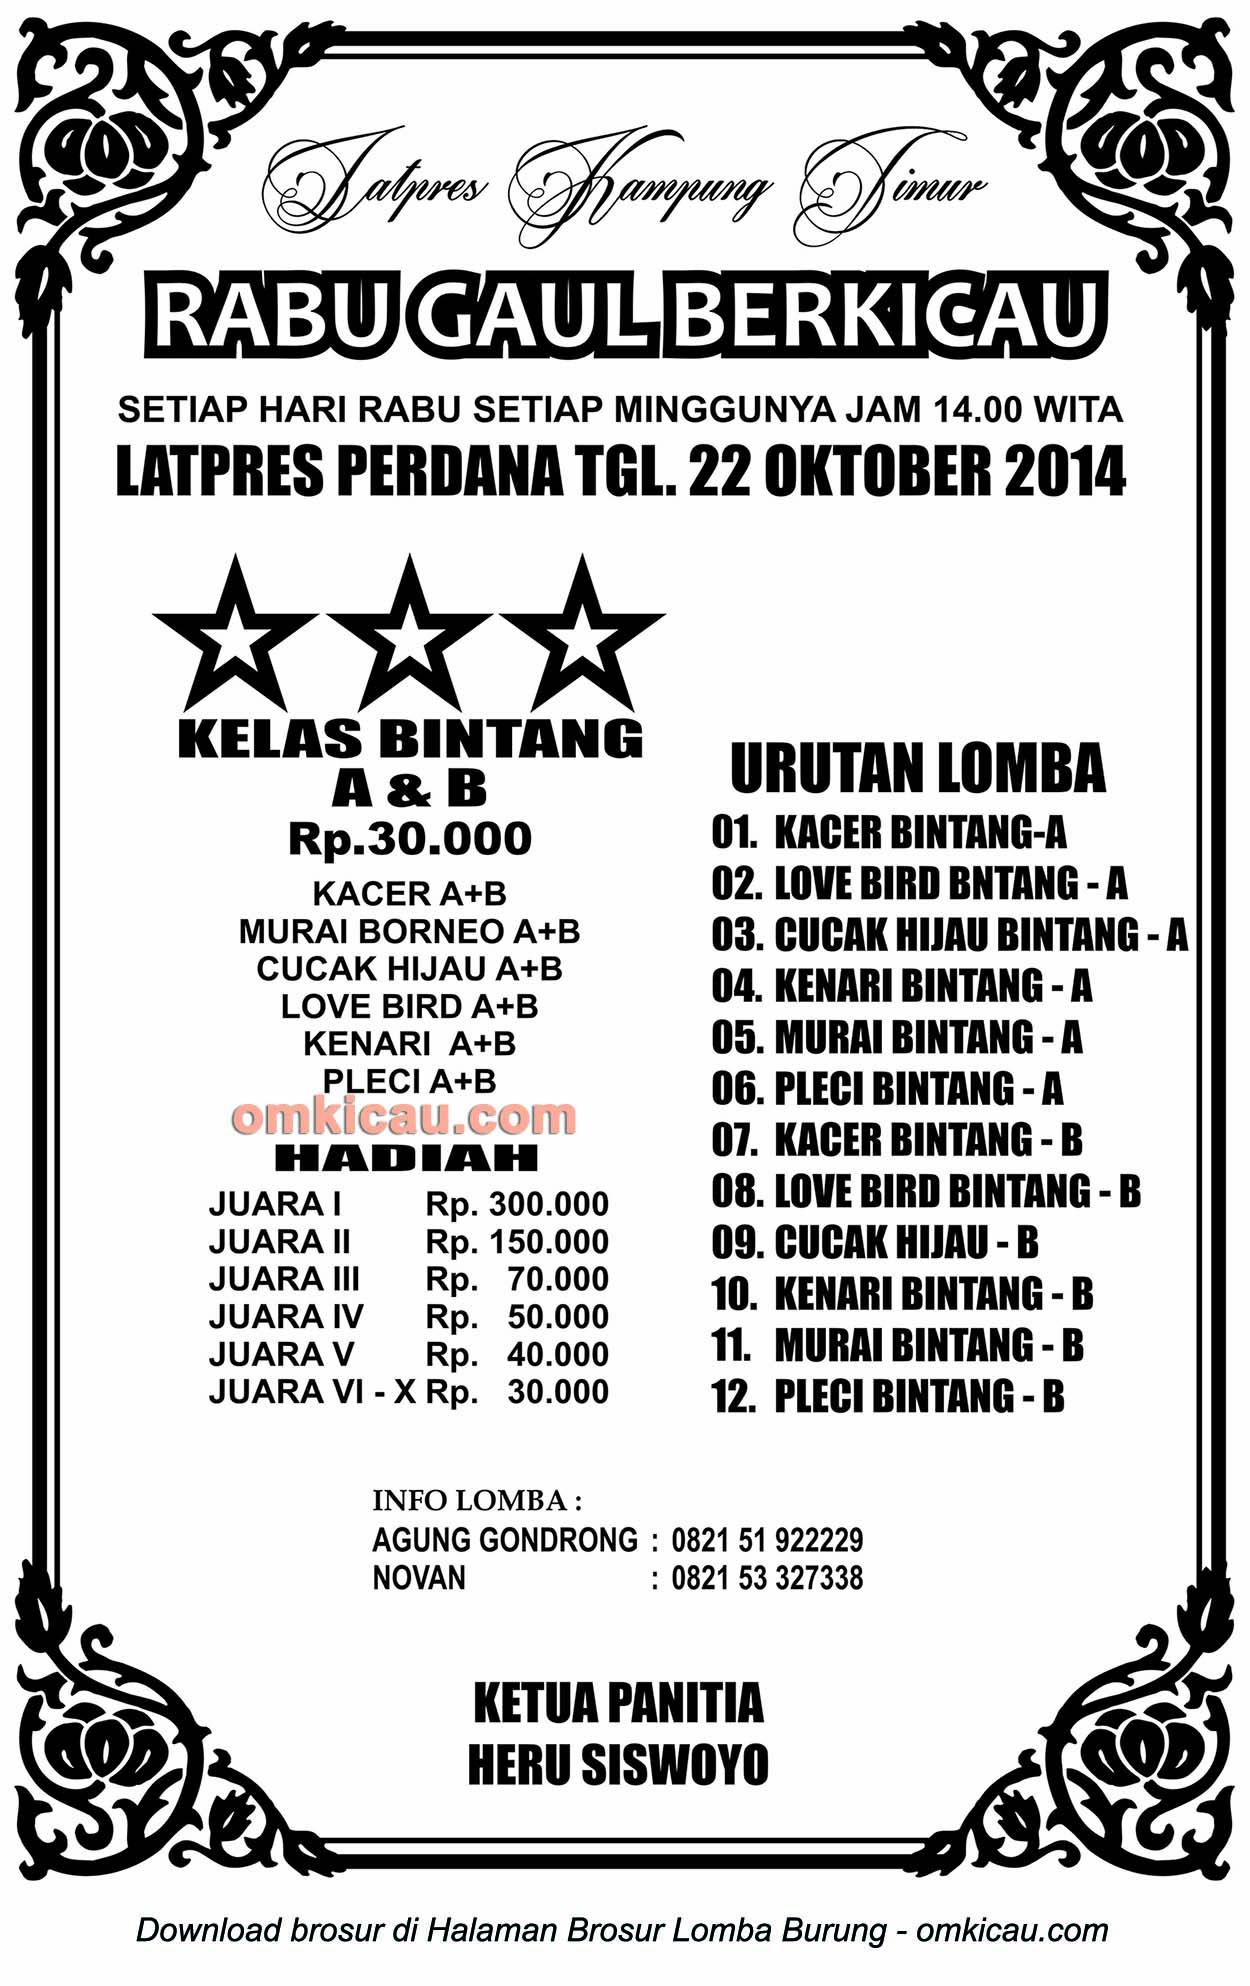 Brosur Latpres Rabu Gaul Berkicau, Balikpapan, 22 Oktober 2014